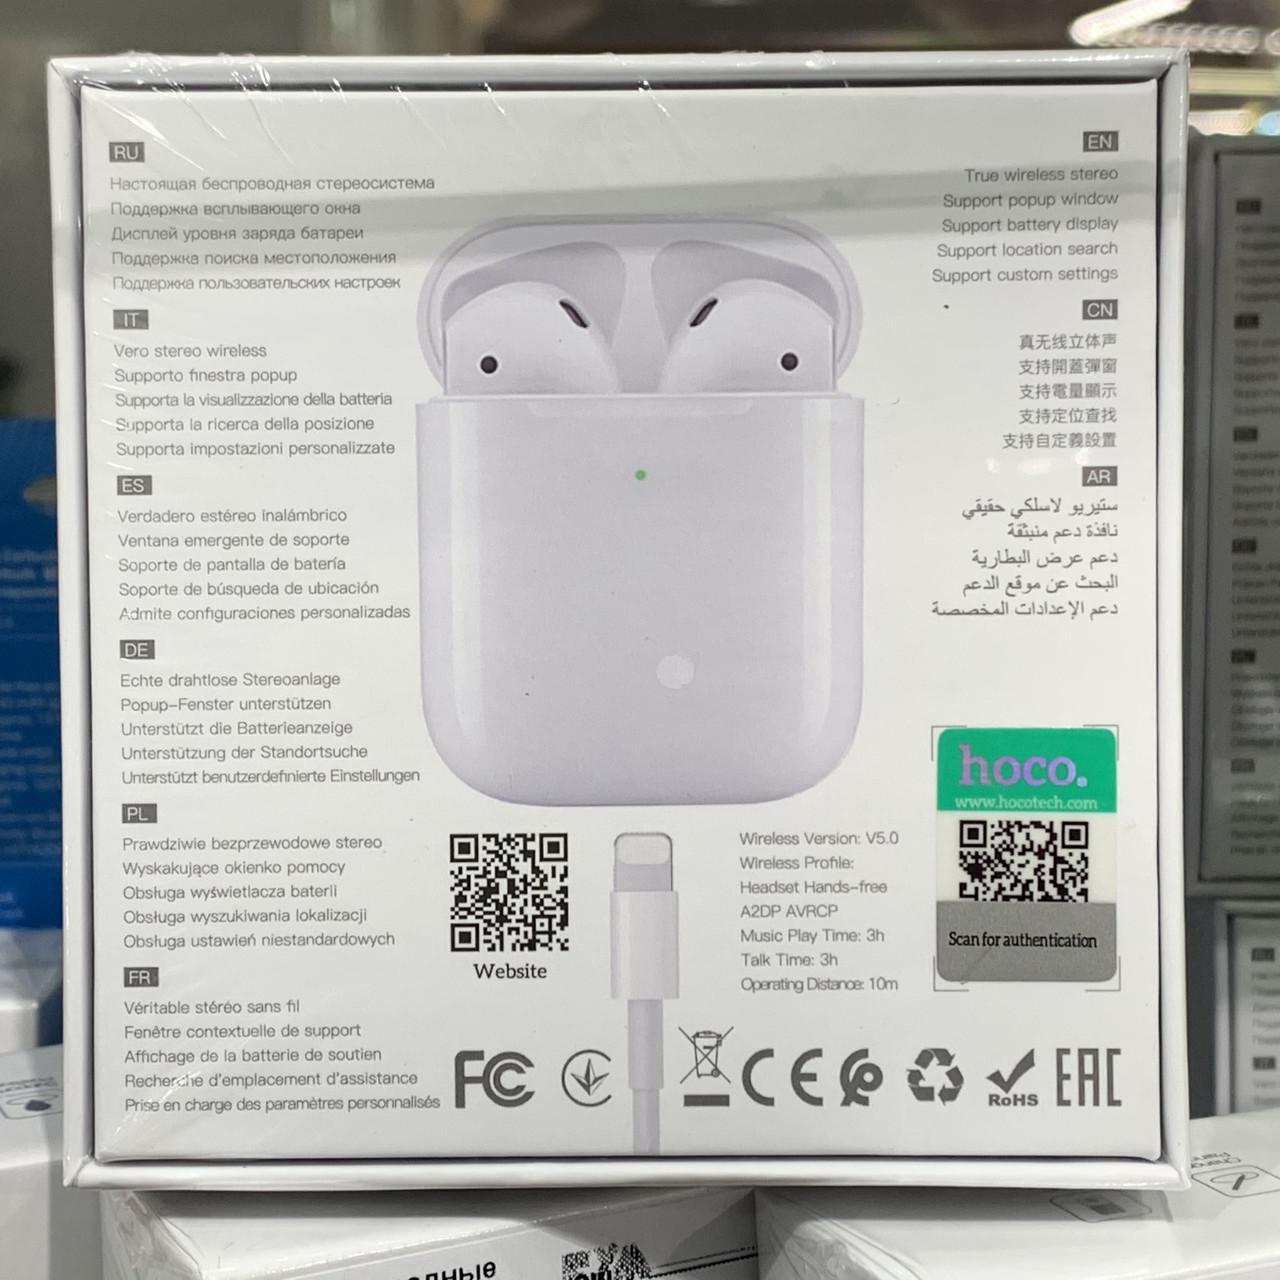 Гарнитура bluetooth Hoco ES49 Оригинал Вкладыши Bluetooth